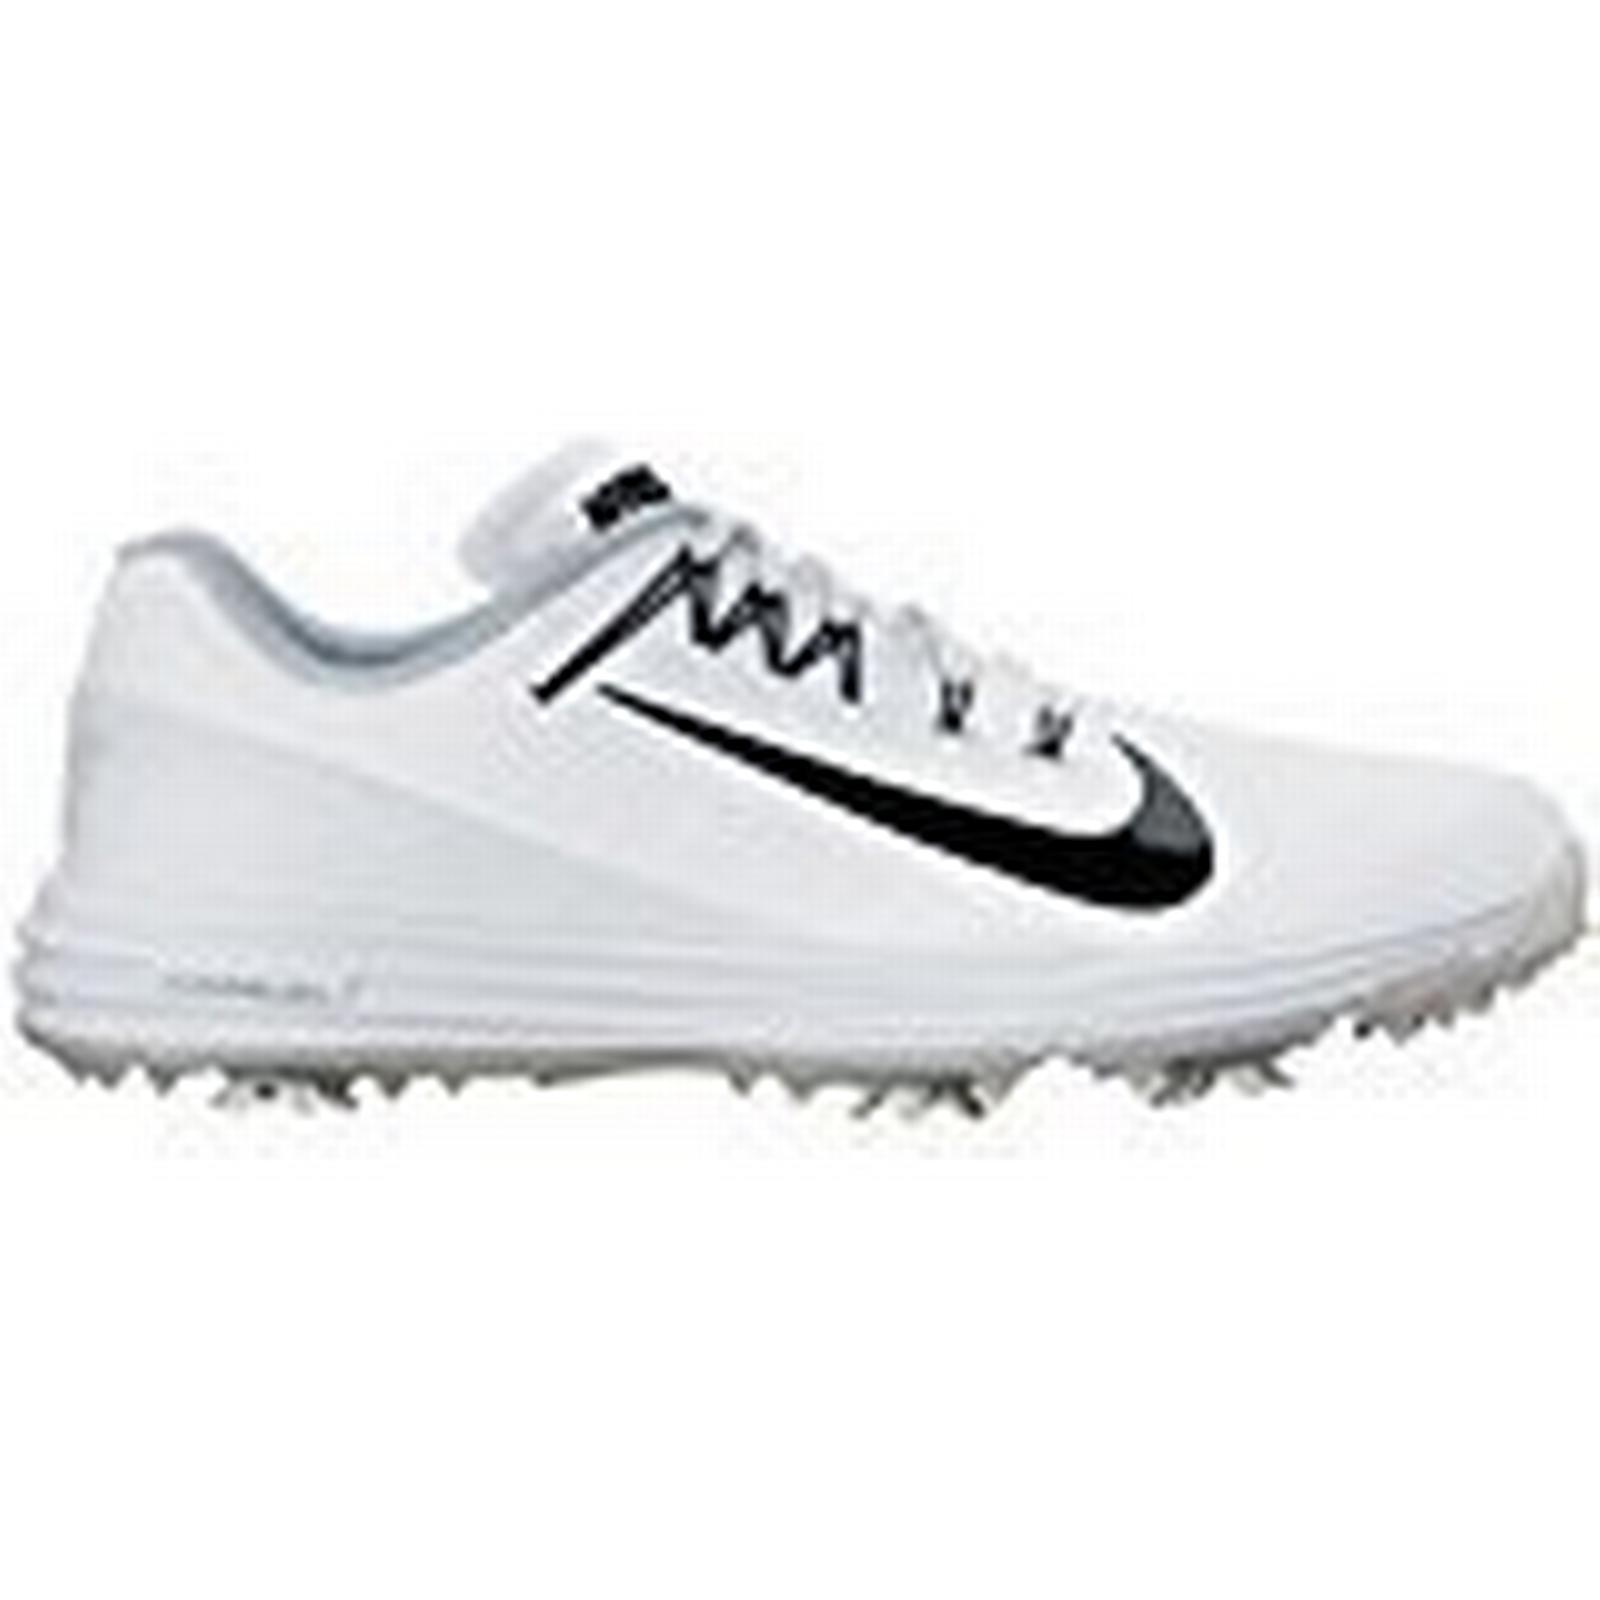 Nike Women's Lunar Command 7 2 Golf Shoes, (White/Black), 7 Command UK 328598